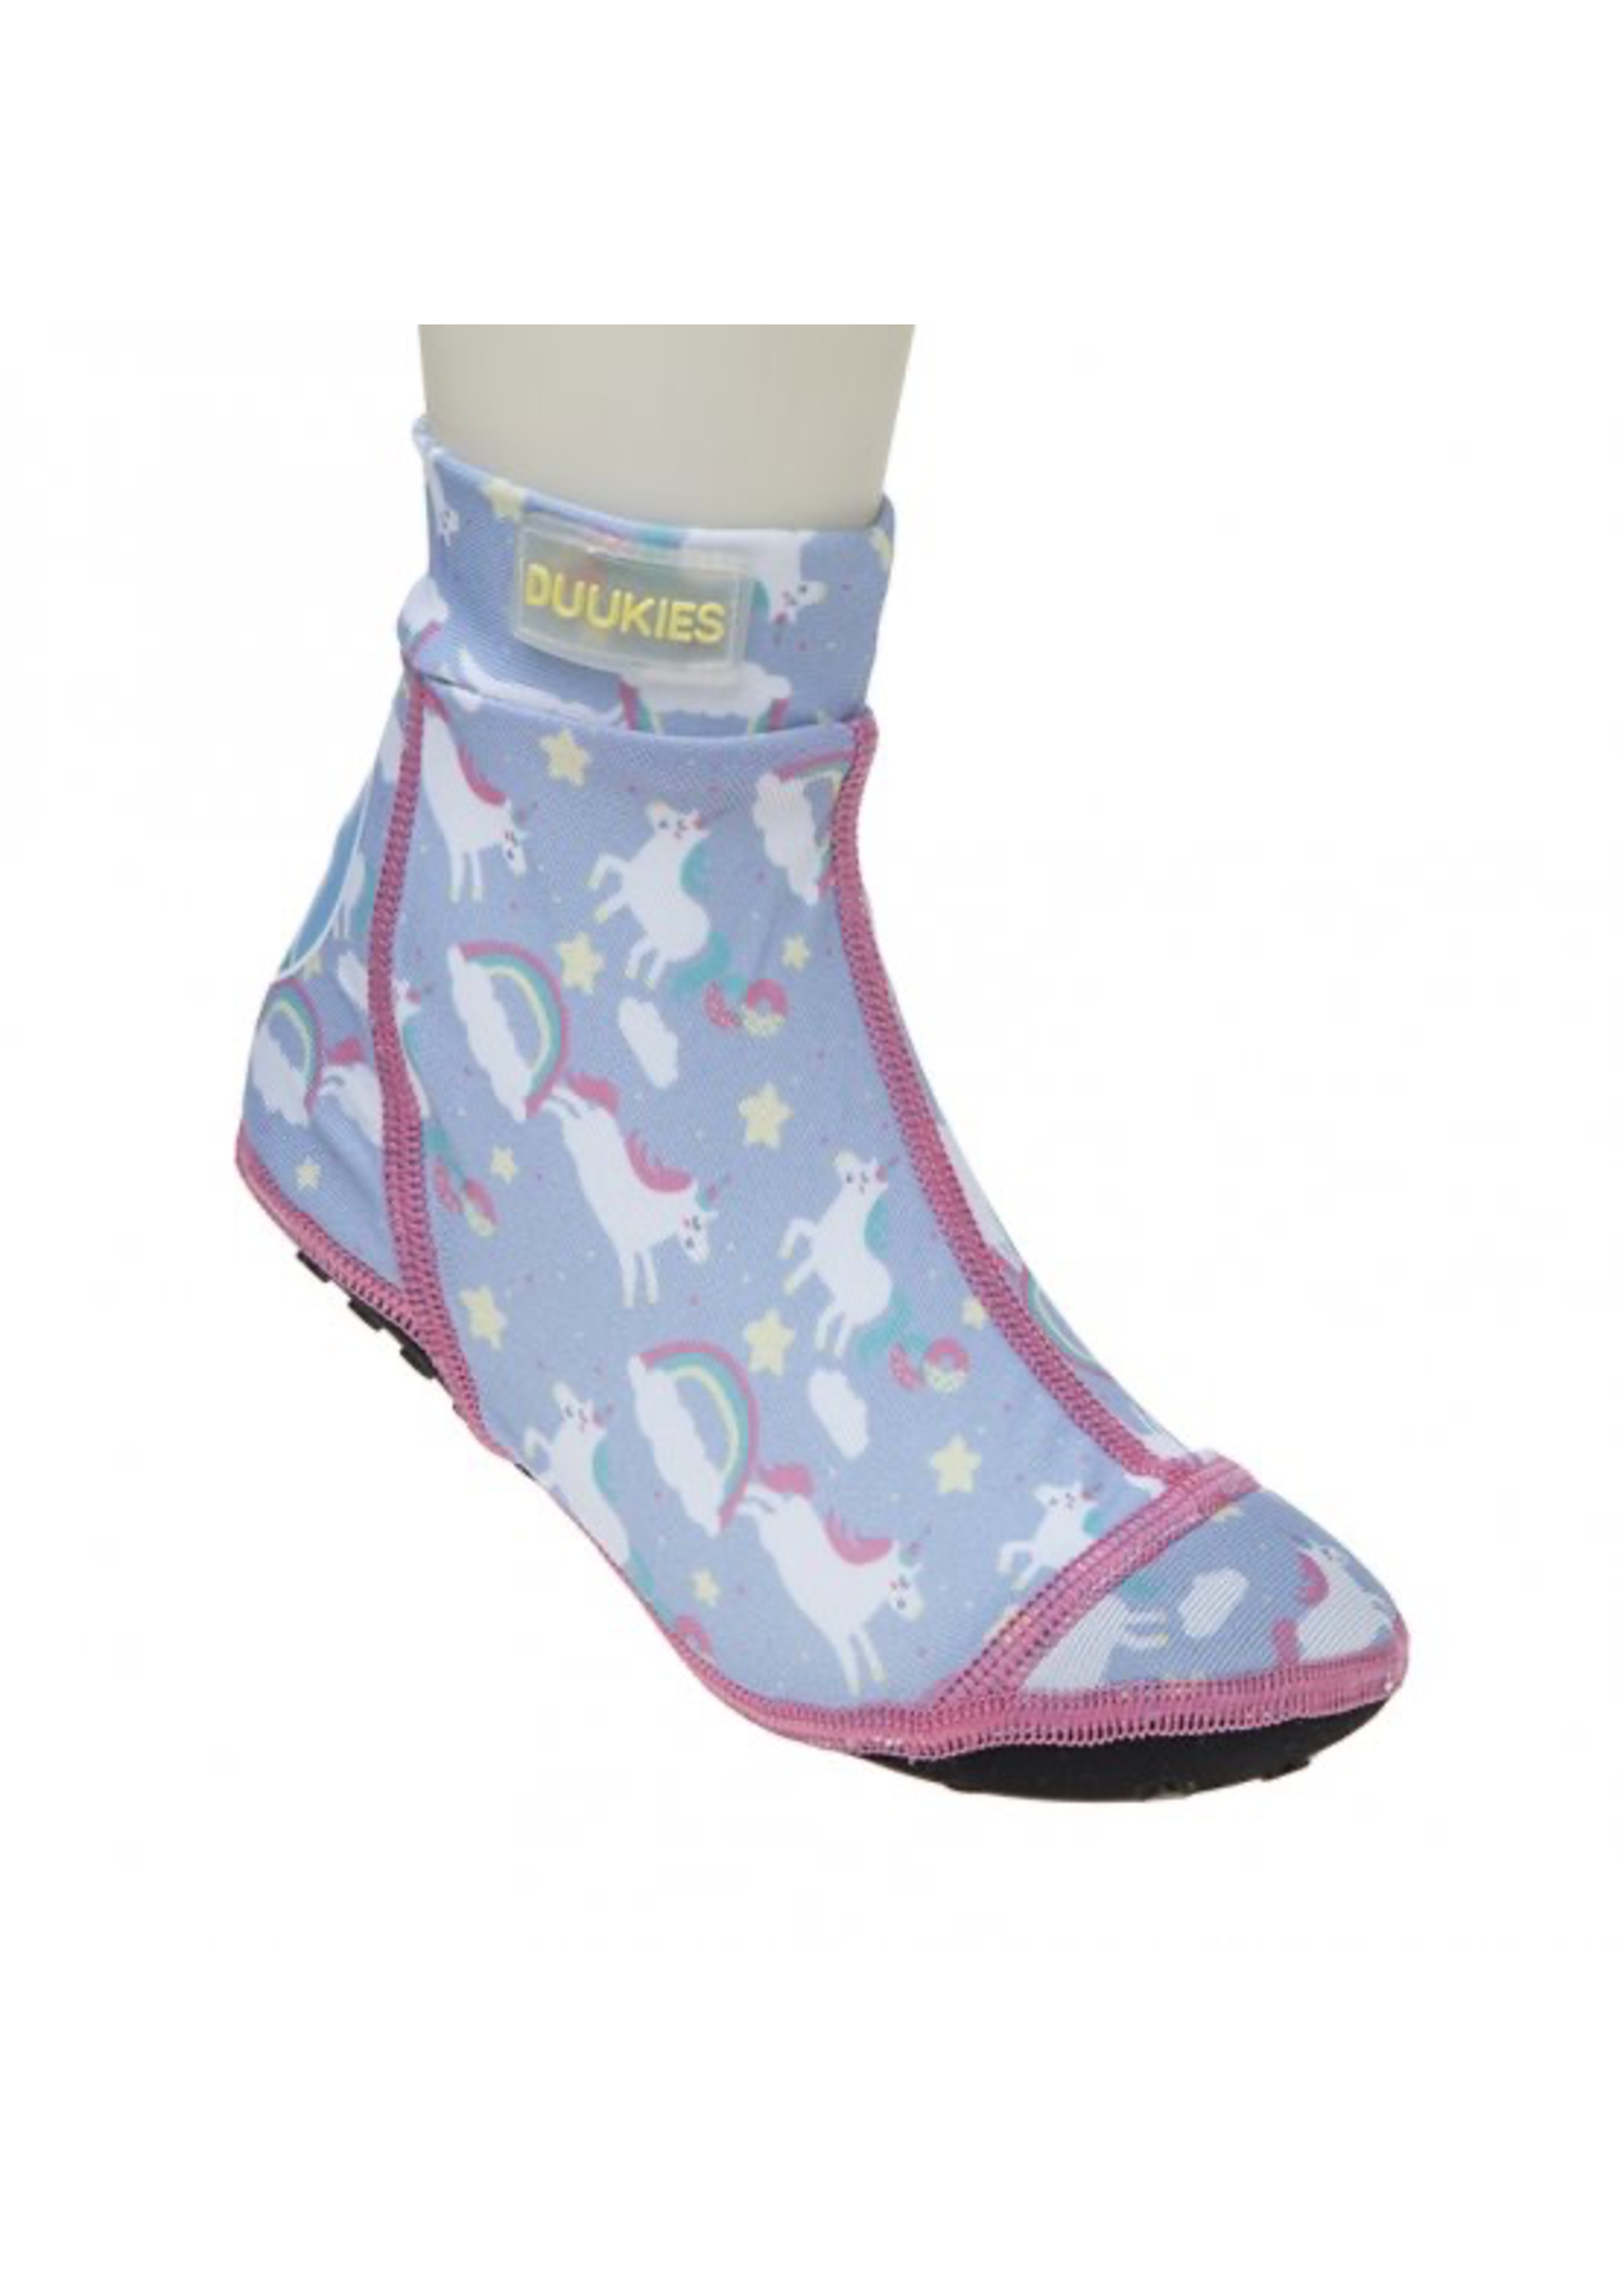 Duukies Duukies, Beach Socks for Girl - P-60991